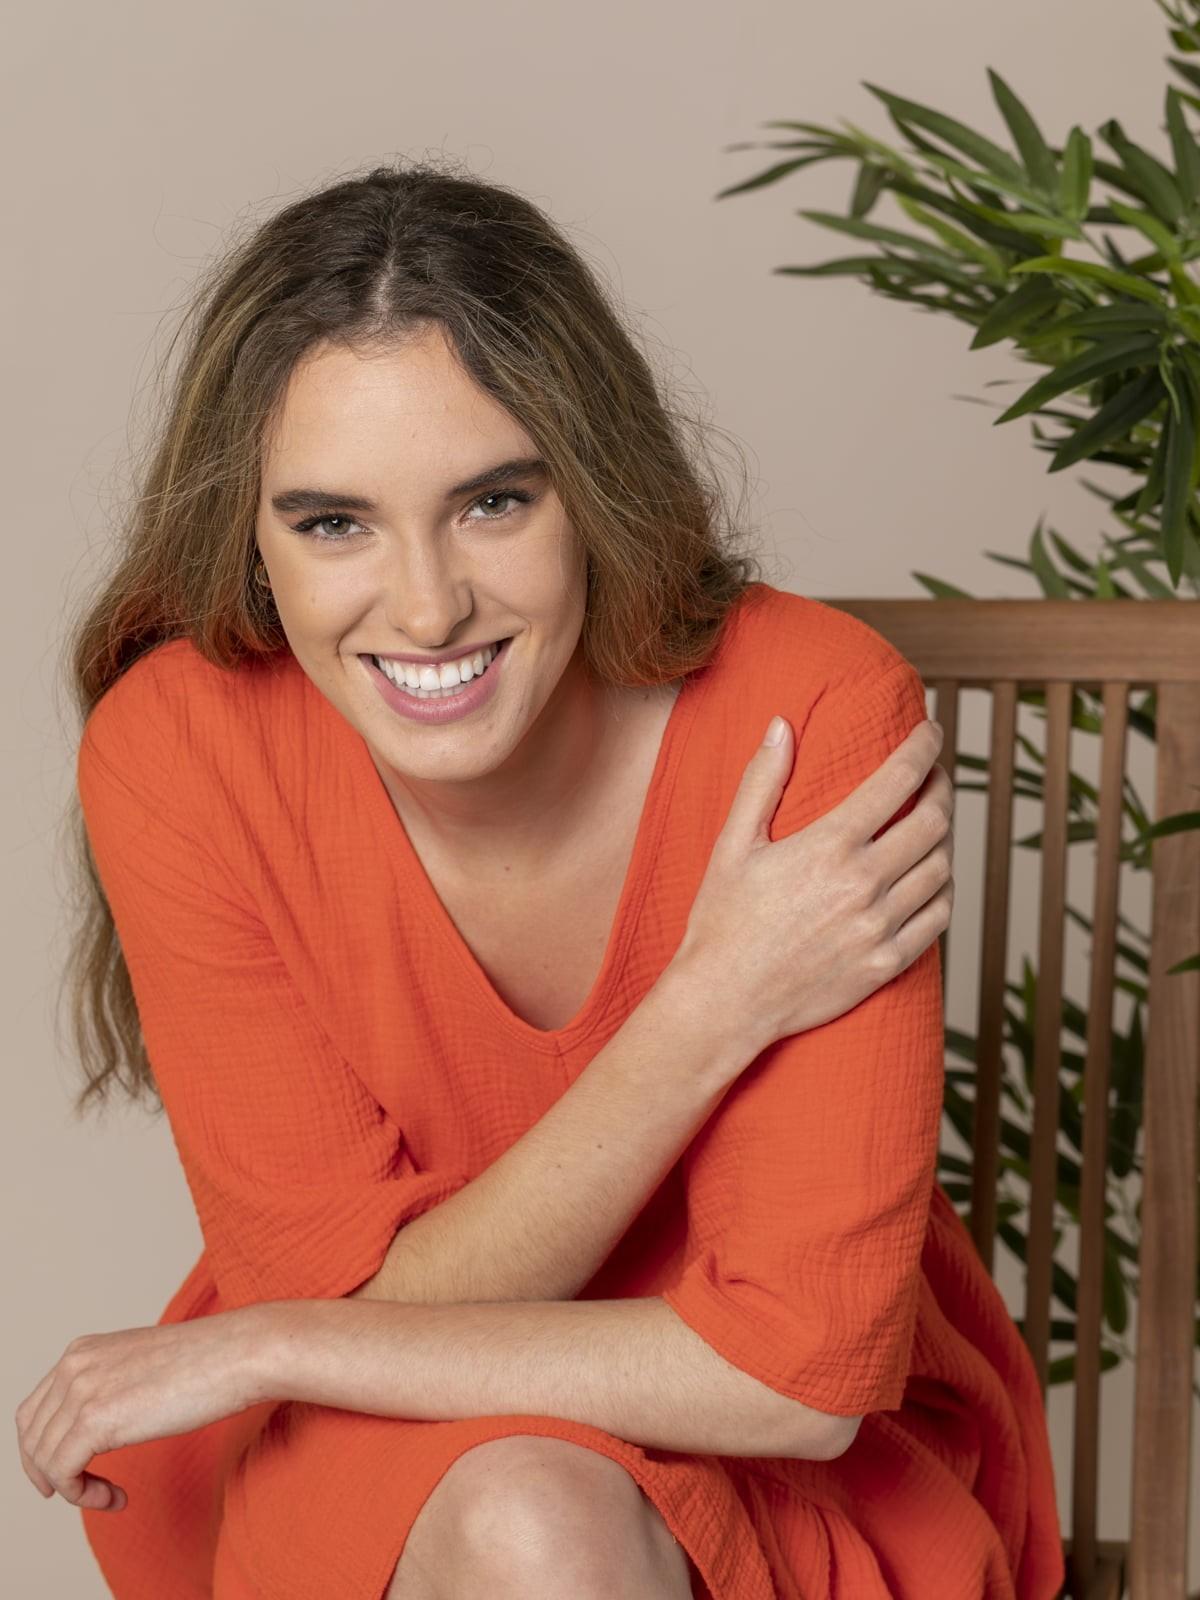 Woman Trendy fabric drop dress Orange